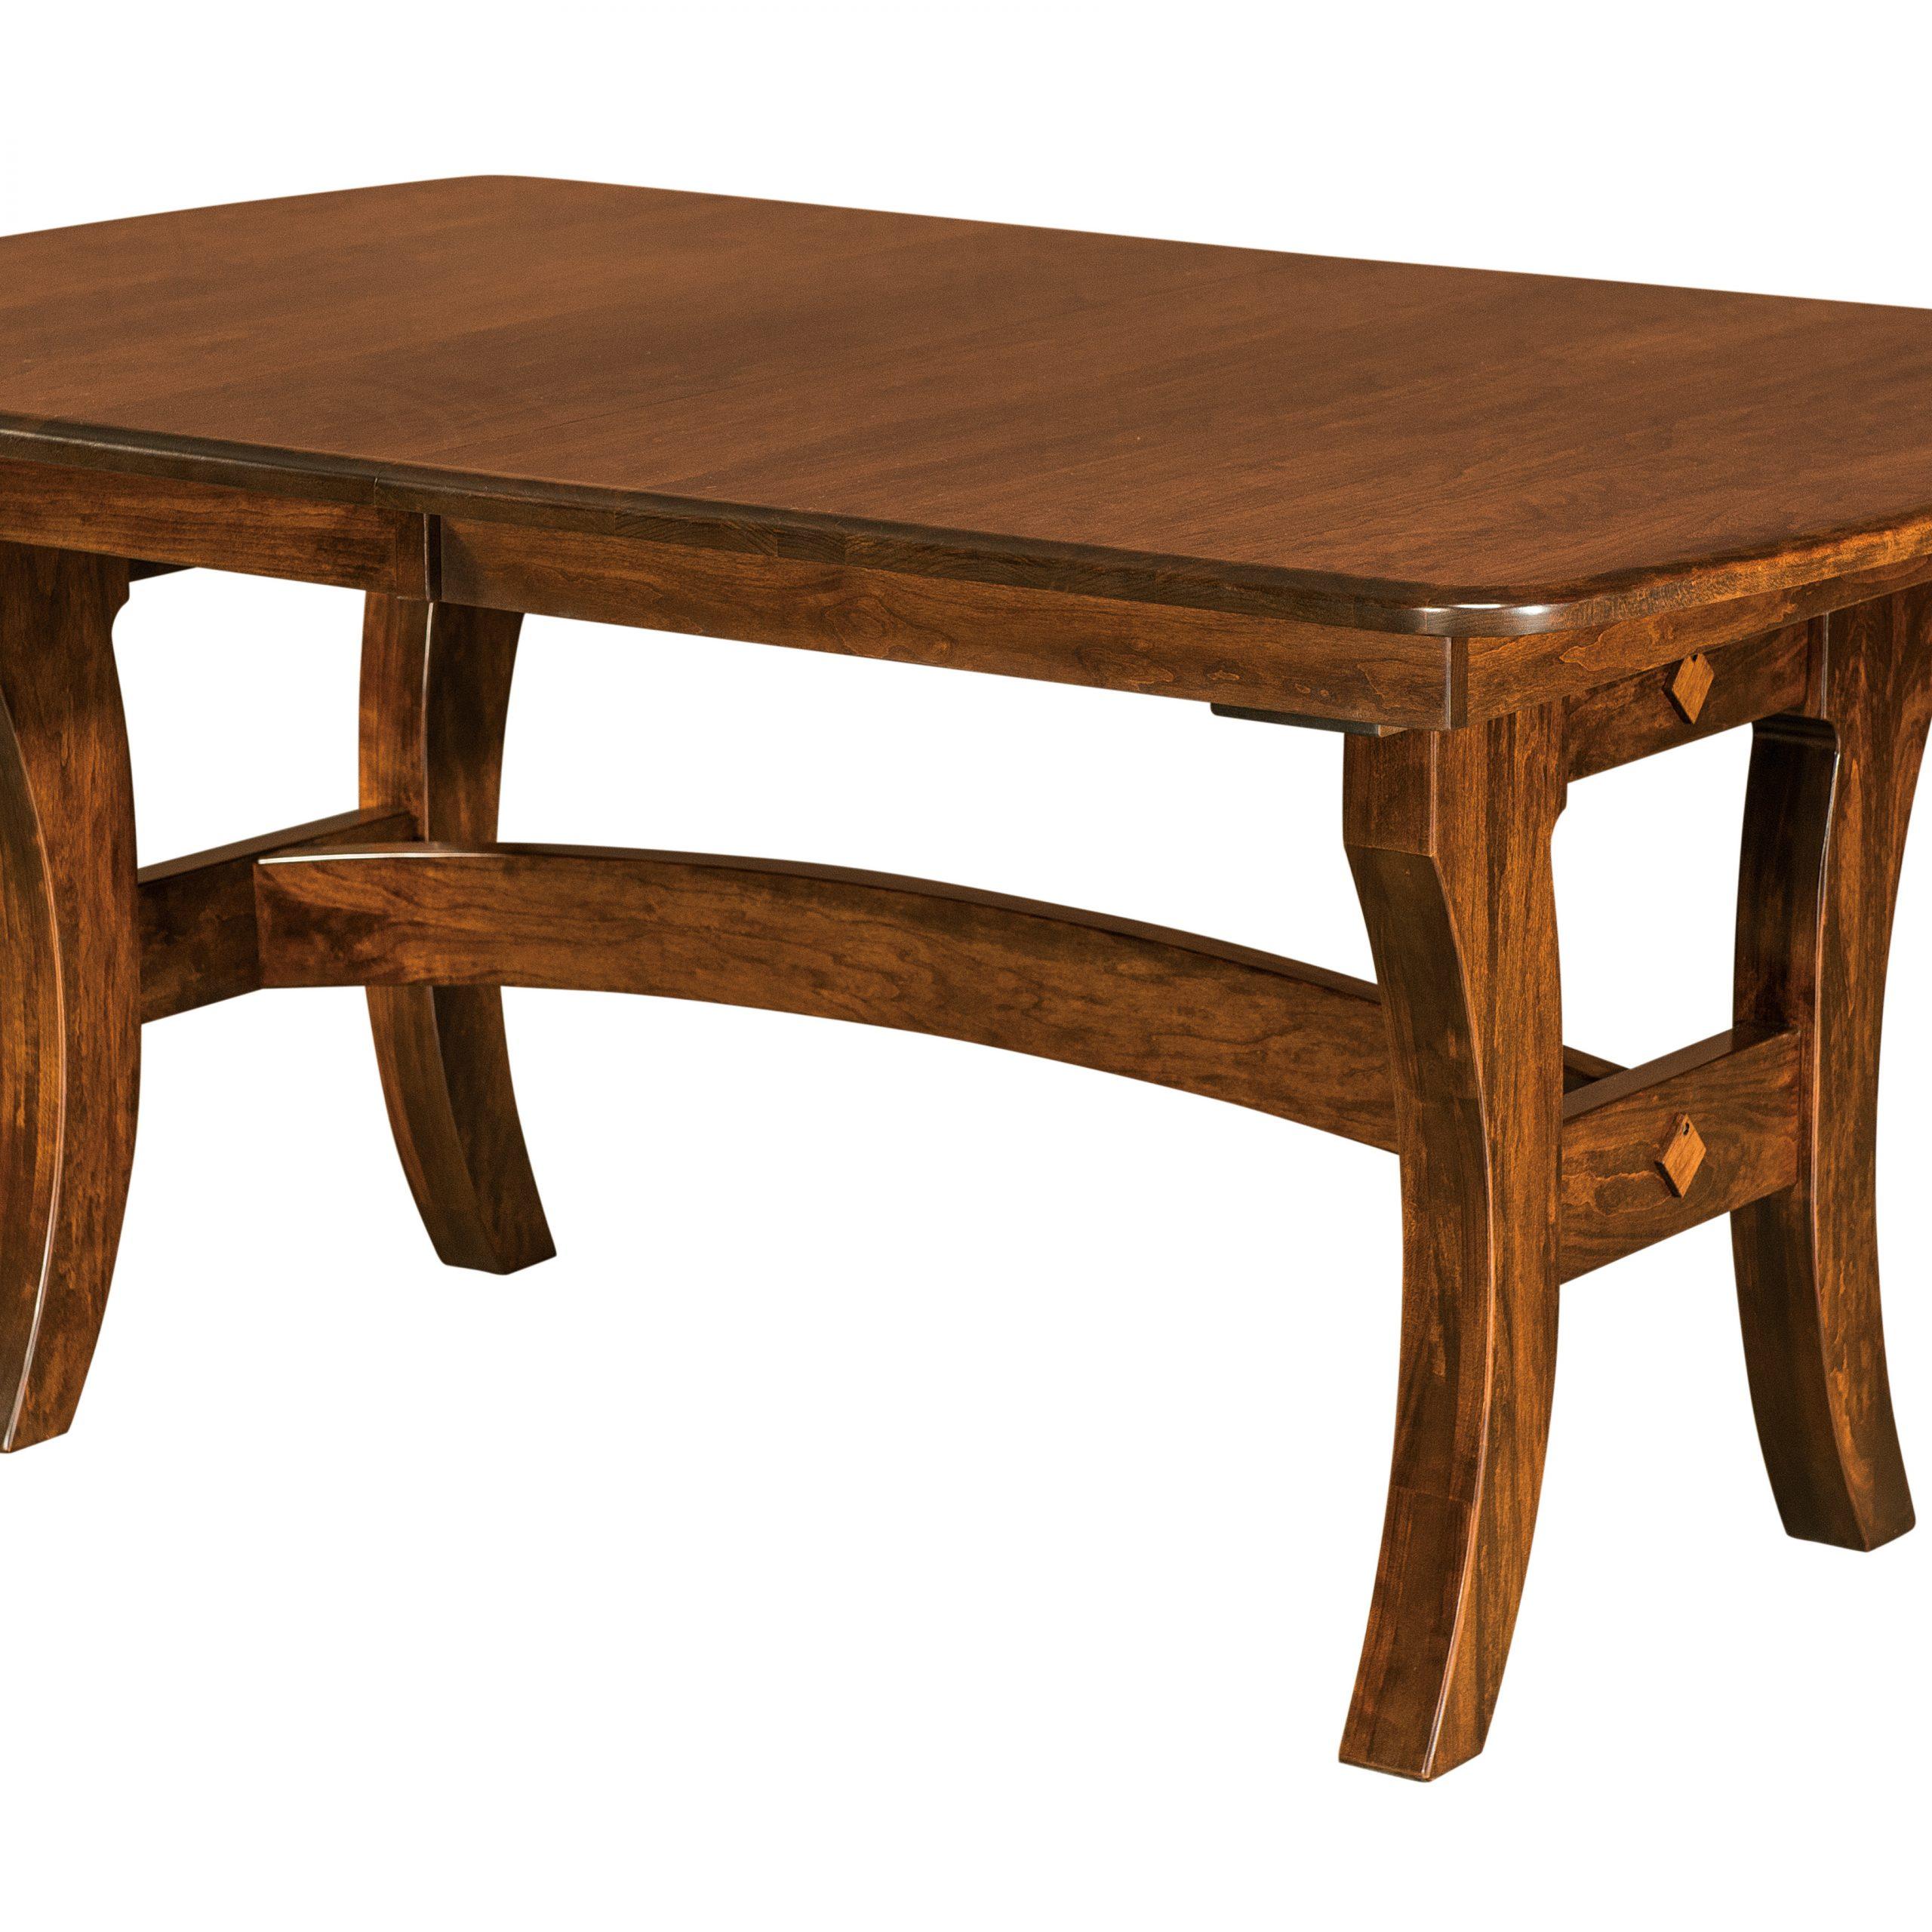 Abilene Trestle Table   Hardwood Creations Within Current Haddington 42'' Trestle Dining Tables (View 5 of 15)